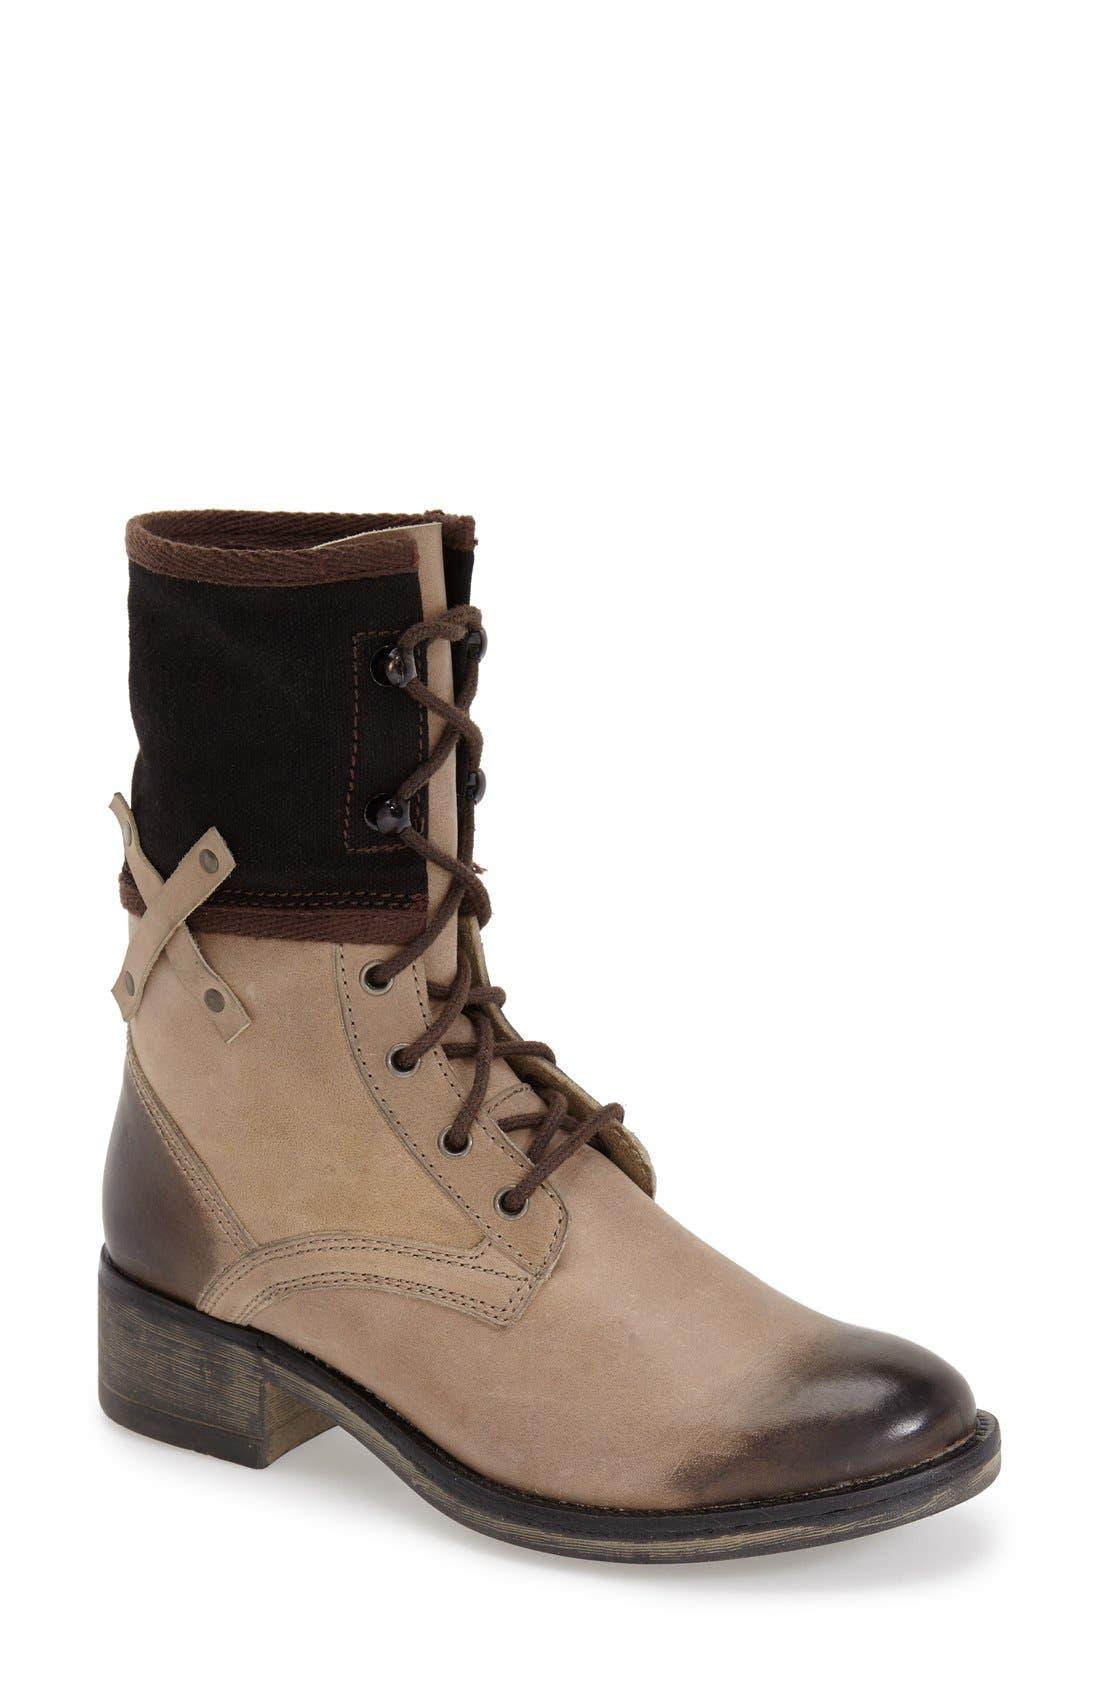 Alternate Image 1 Selected - Matisse 'Mechanic' Combat Boot (Women)